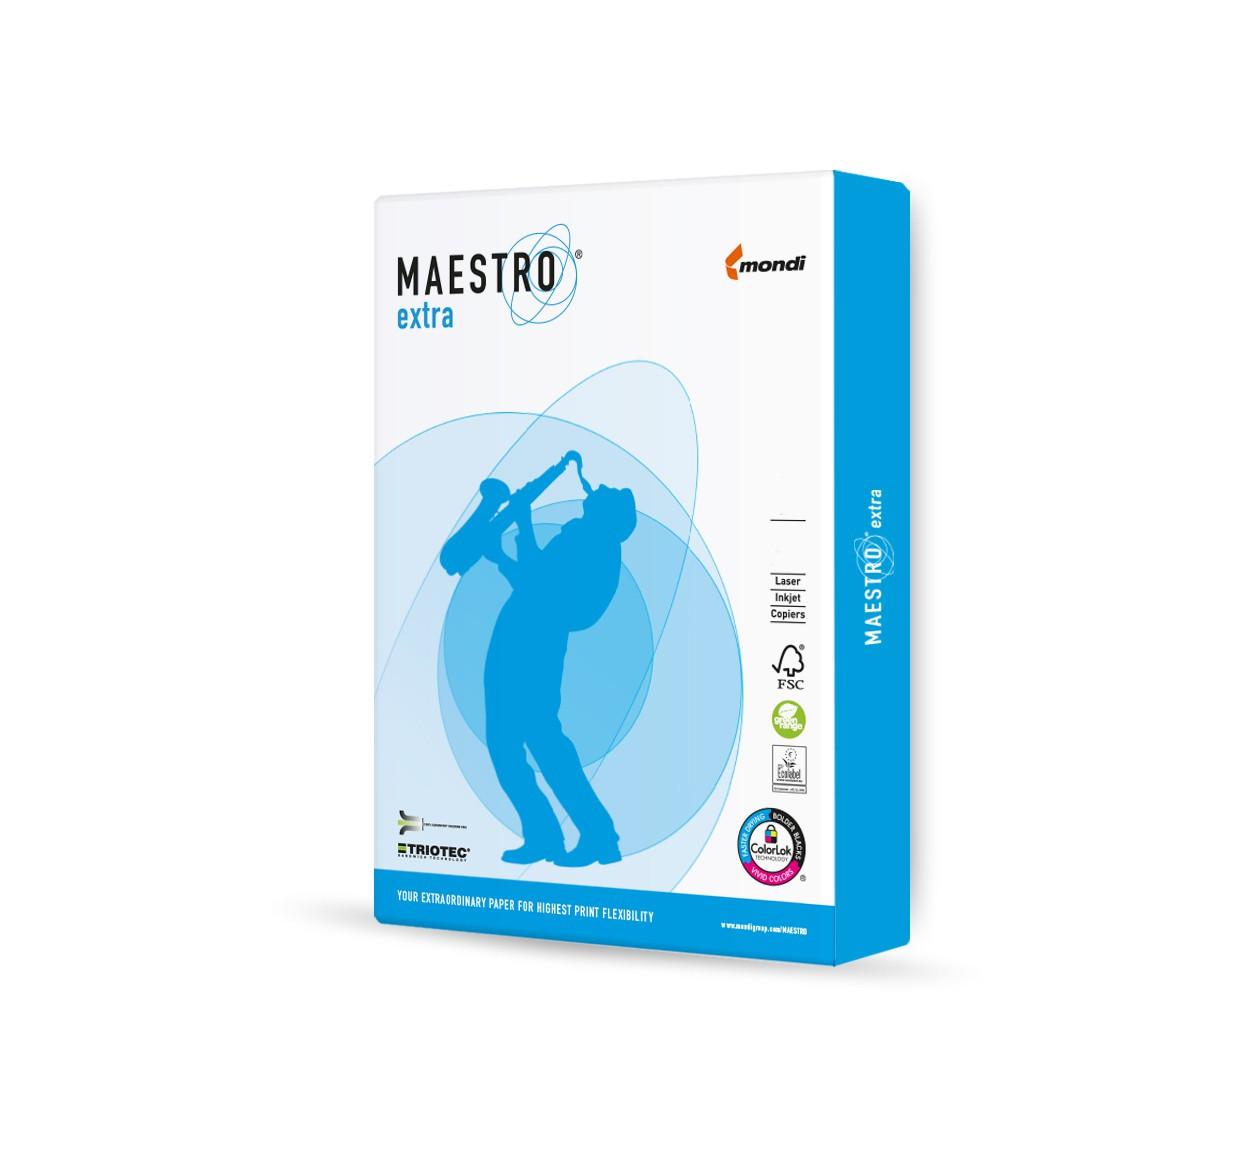 Maestro Extra Kopierpapier 60g/m² DIN-A4 - 500 Blatt weiß